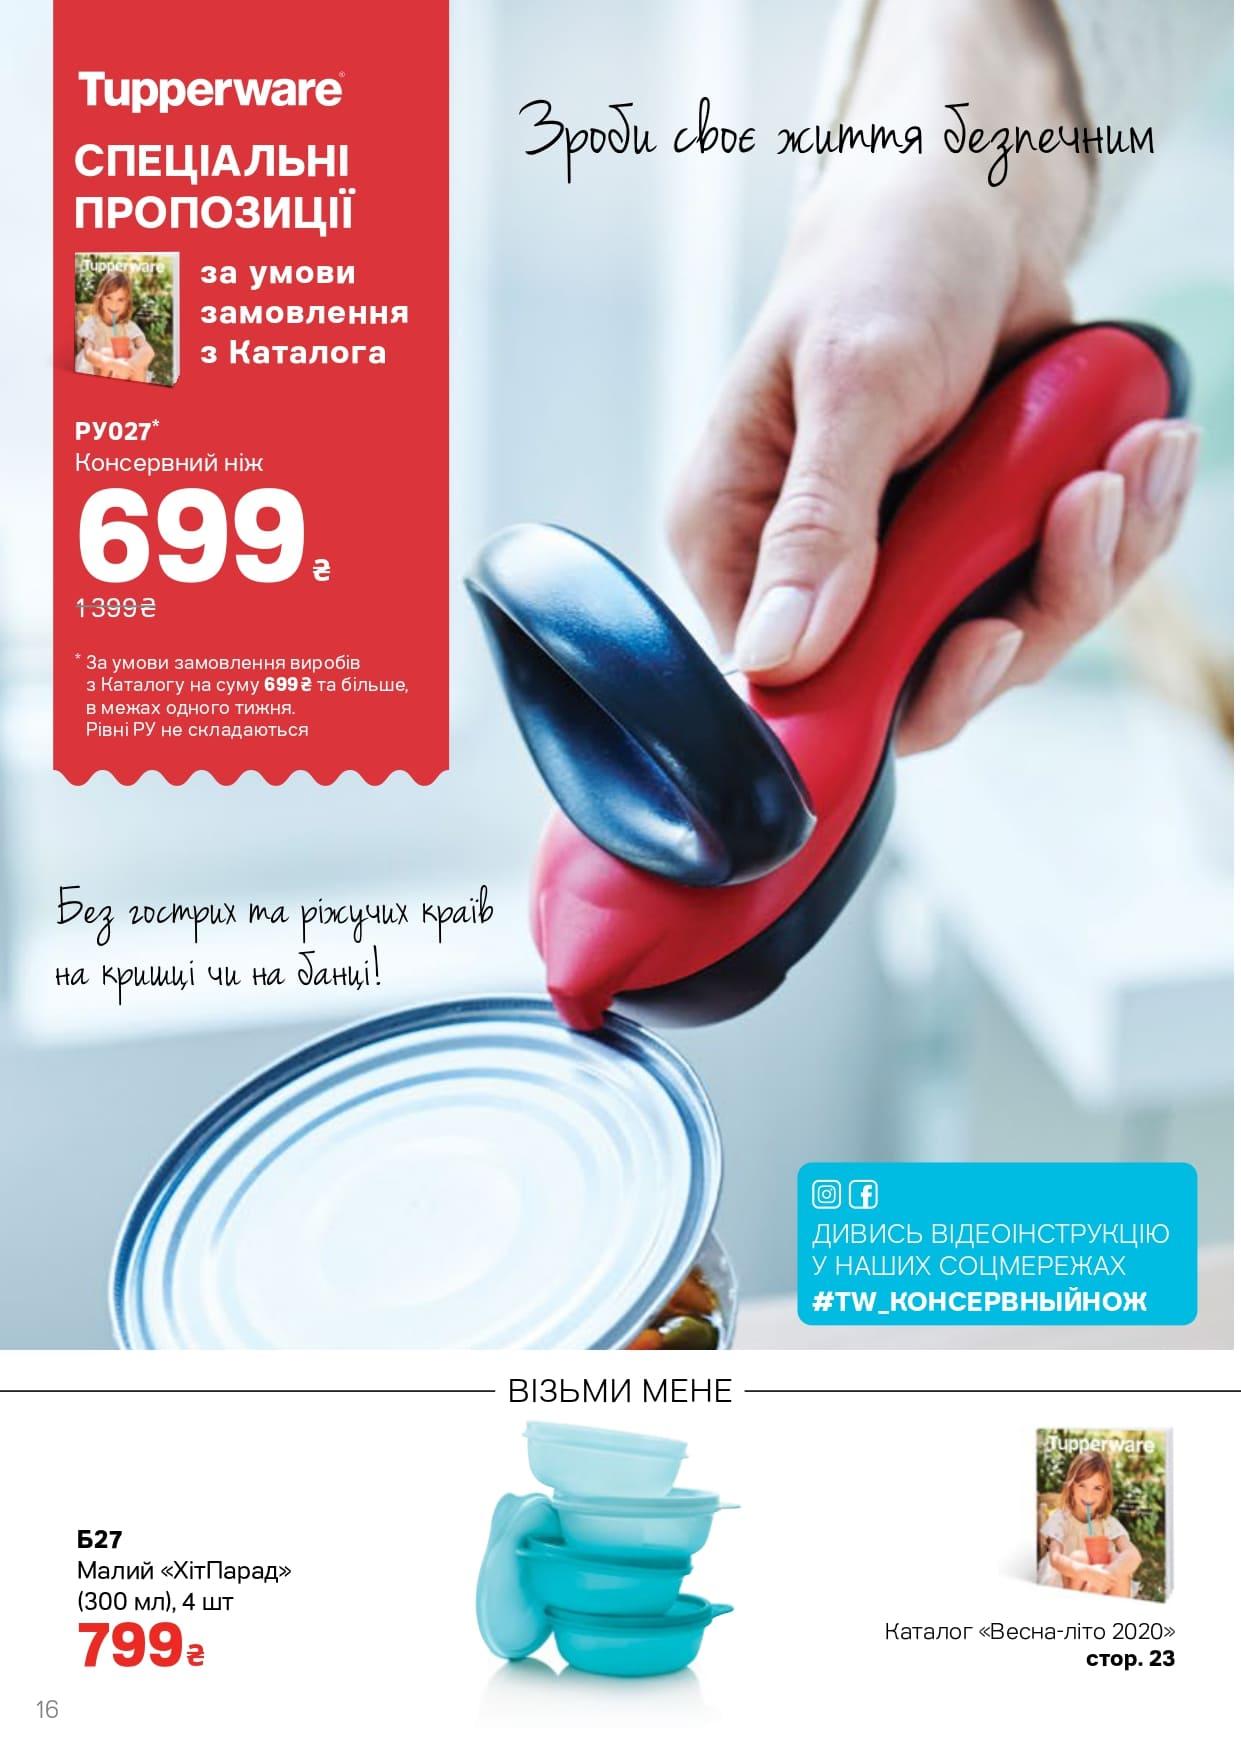 Консервный нож Tupperware, цена в сентябре снижена на 700 грн.